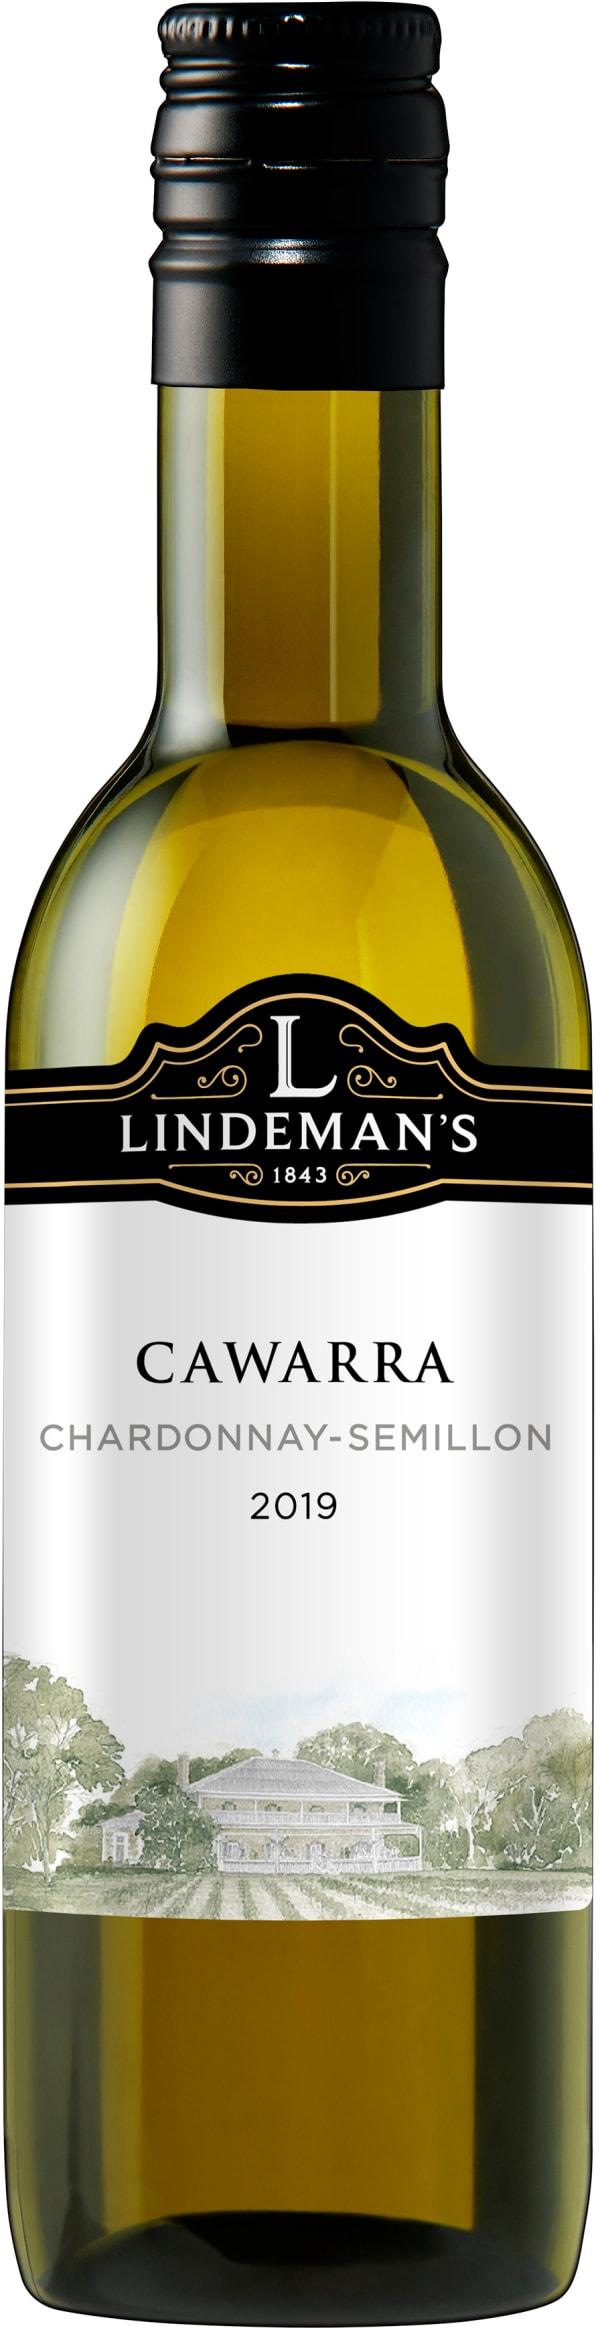 Lindeman's Cawarra Sémillon Chardonnay 2018